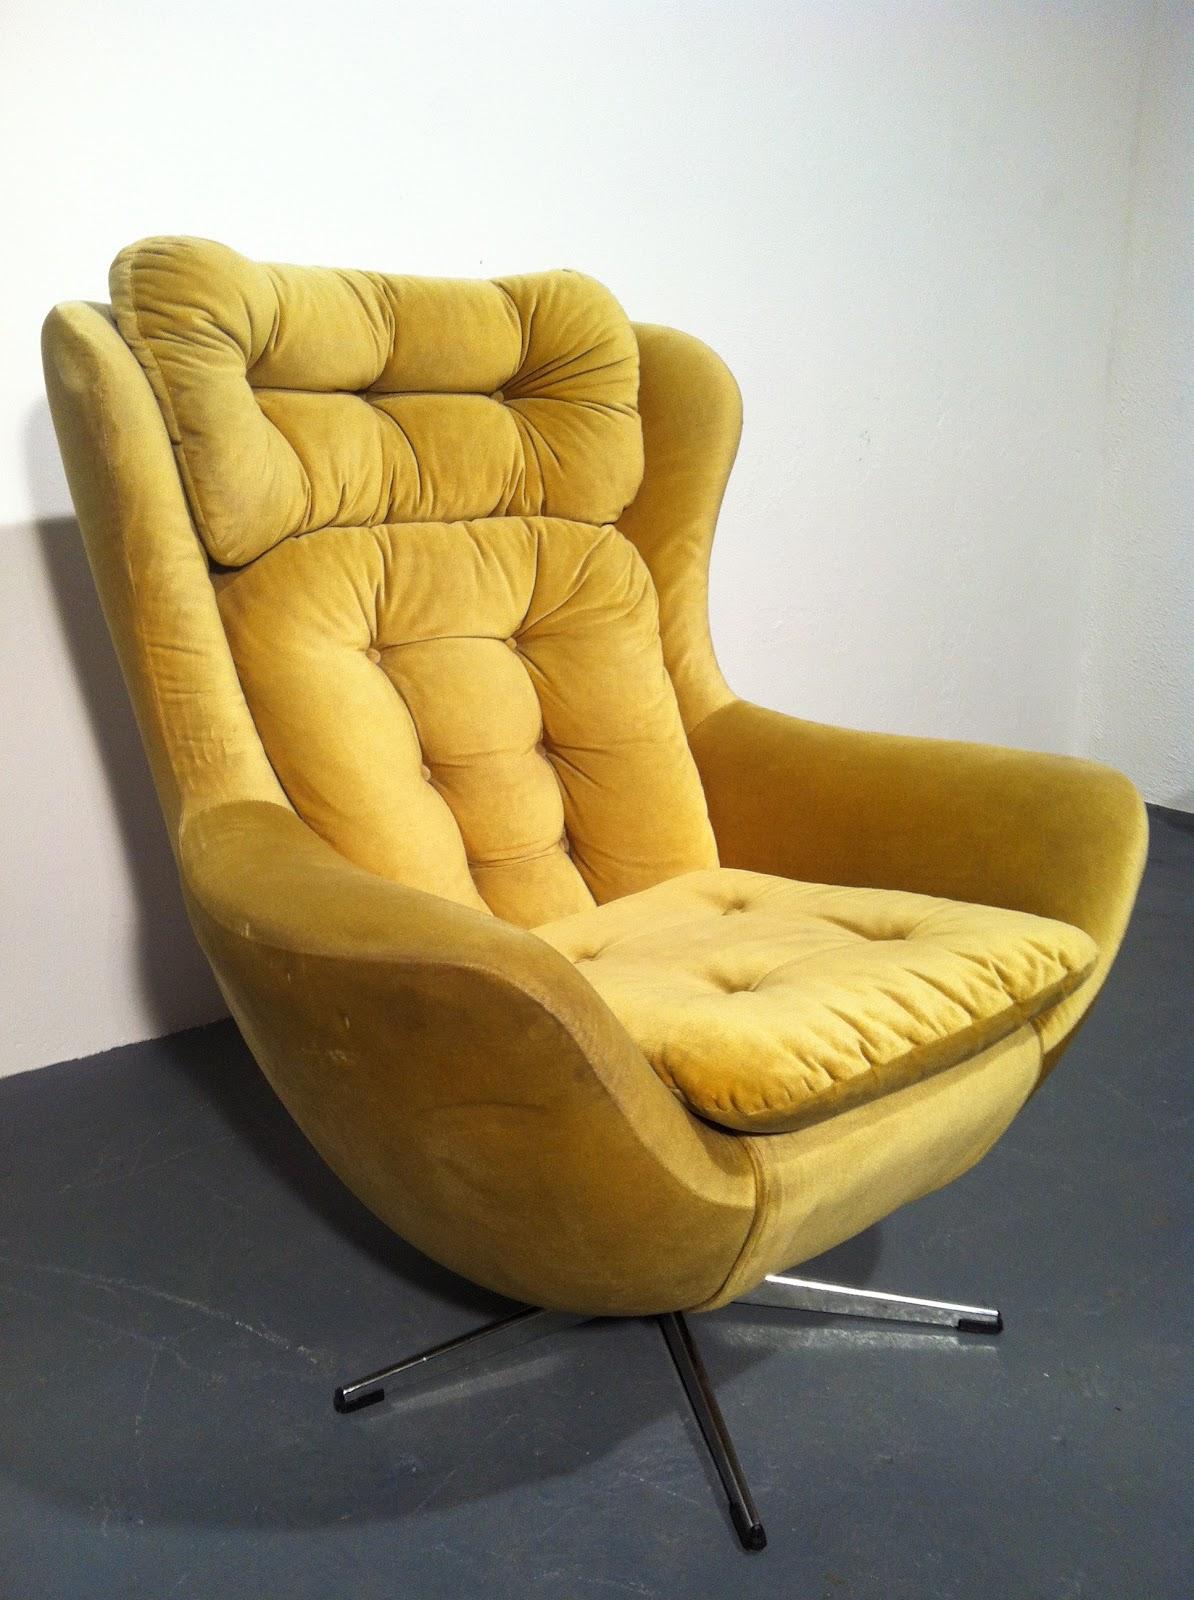 swivel chair ireland modern nursery rocking ocd vintage furniture june 2012